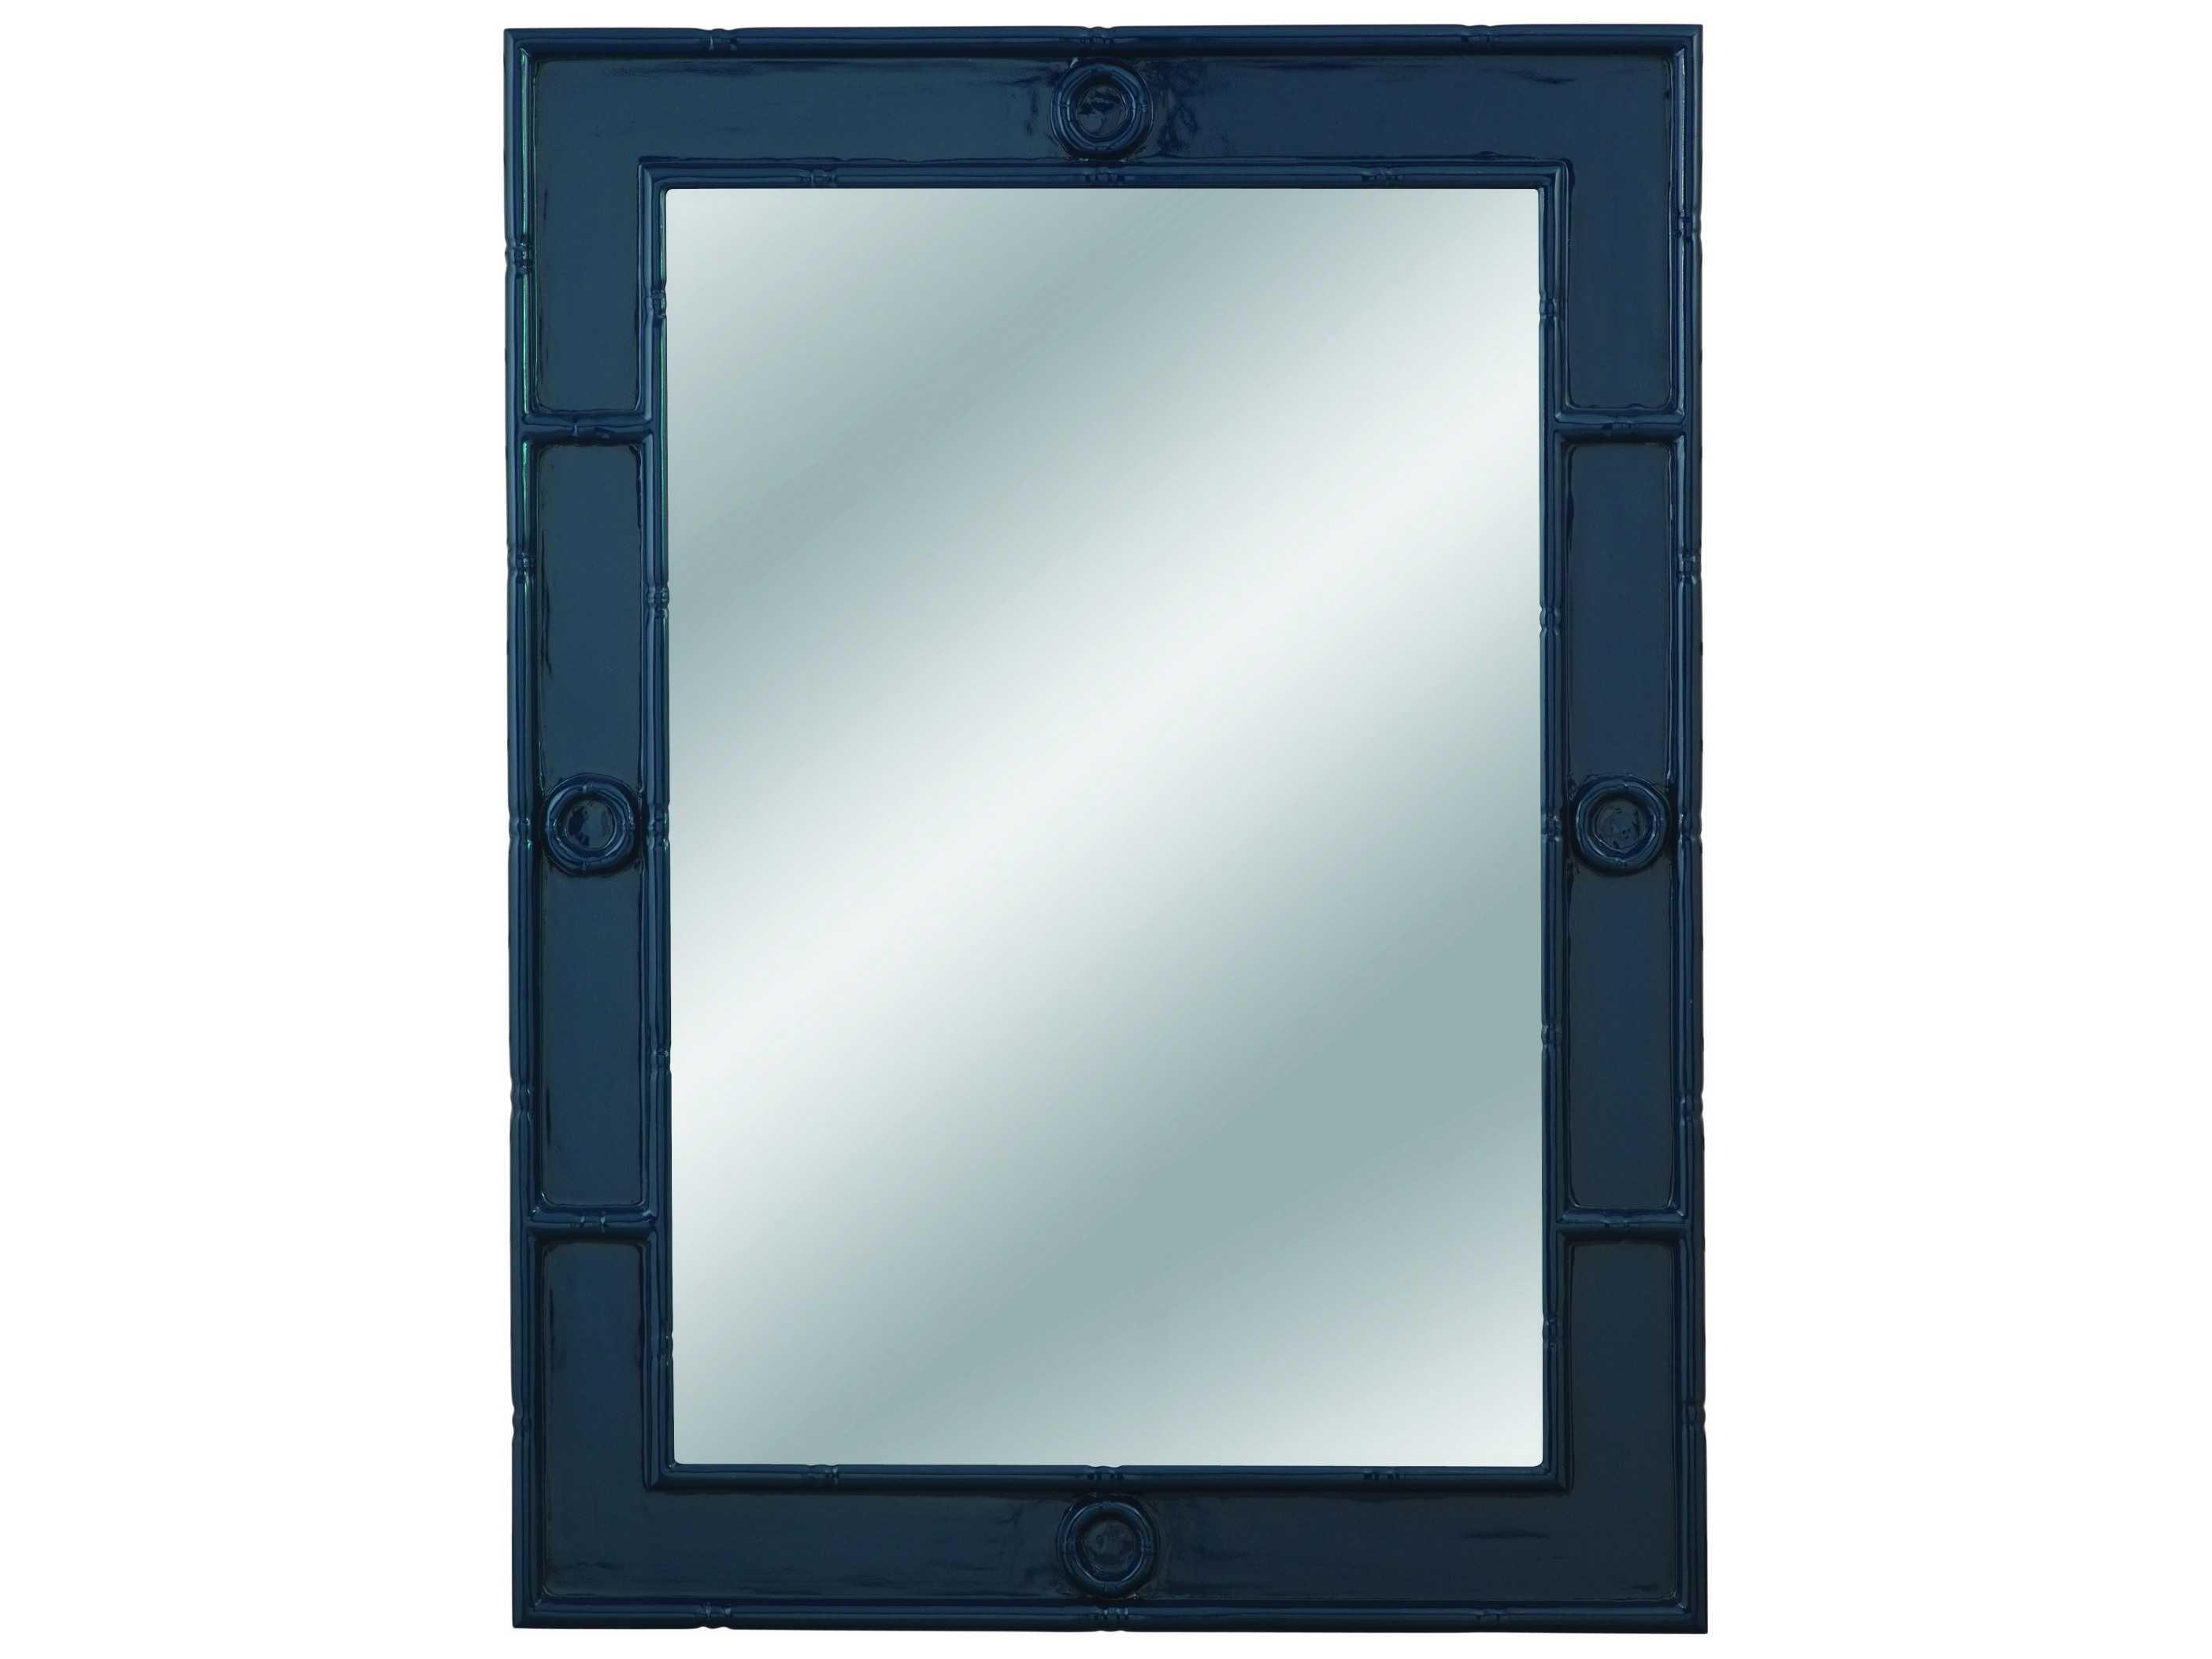 Bassett mirror pan pacific 36 x 48 tybee wall mirror m3700ec for Mirror 48 x 36